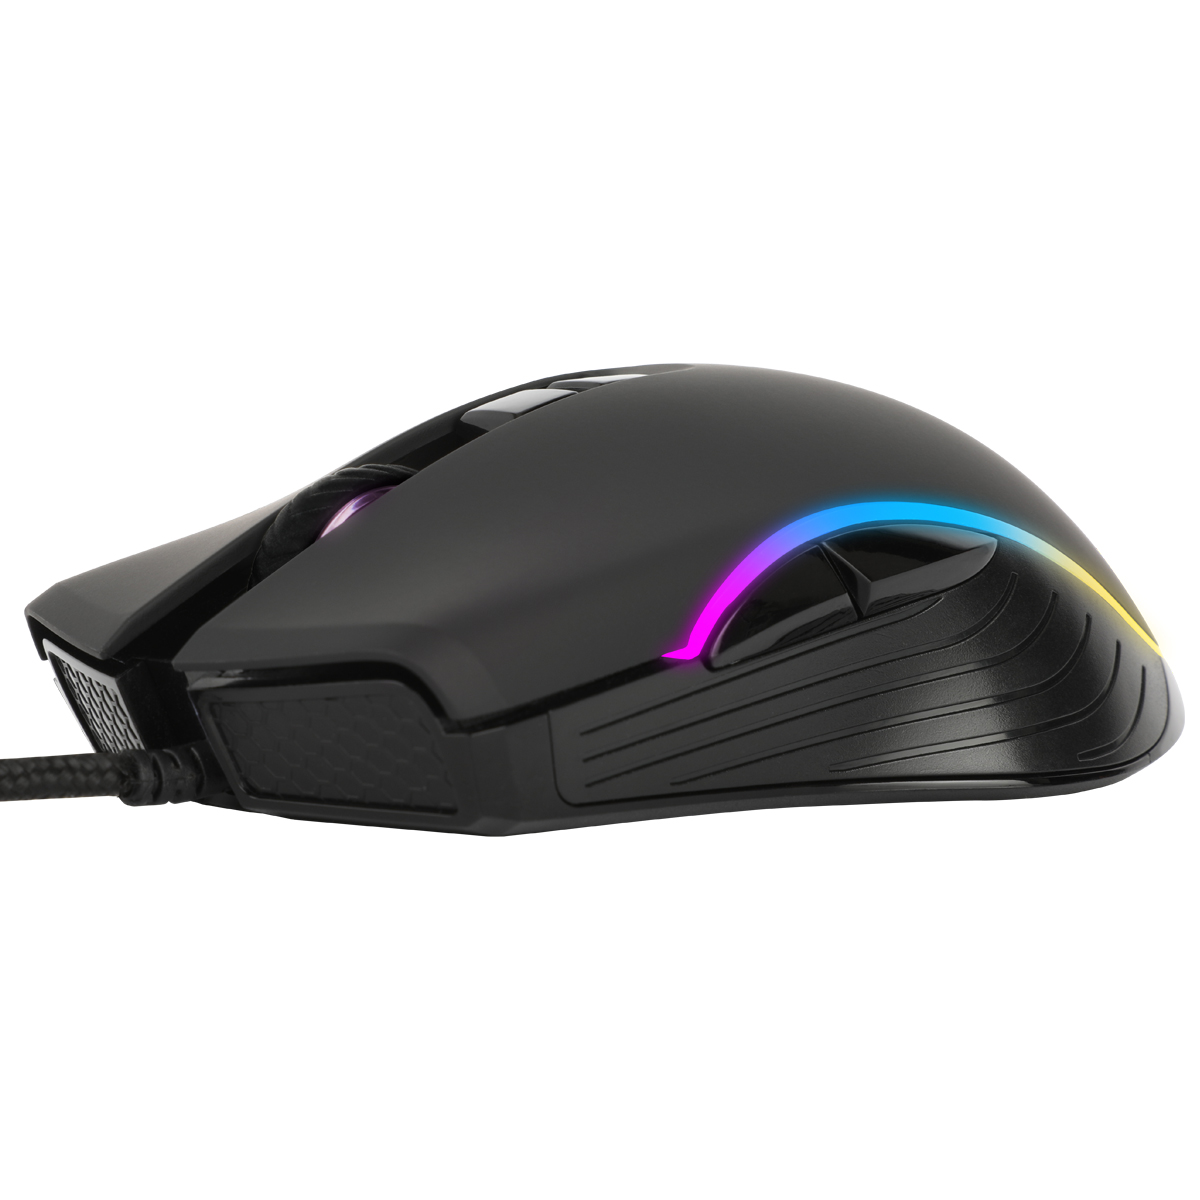 Ratón Gaming Astra AM6 imagen producto